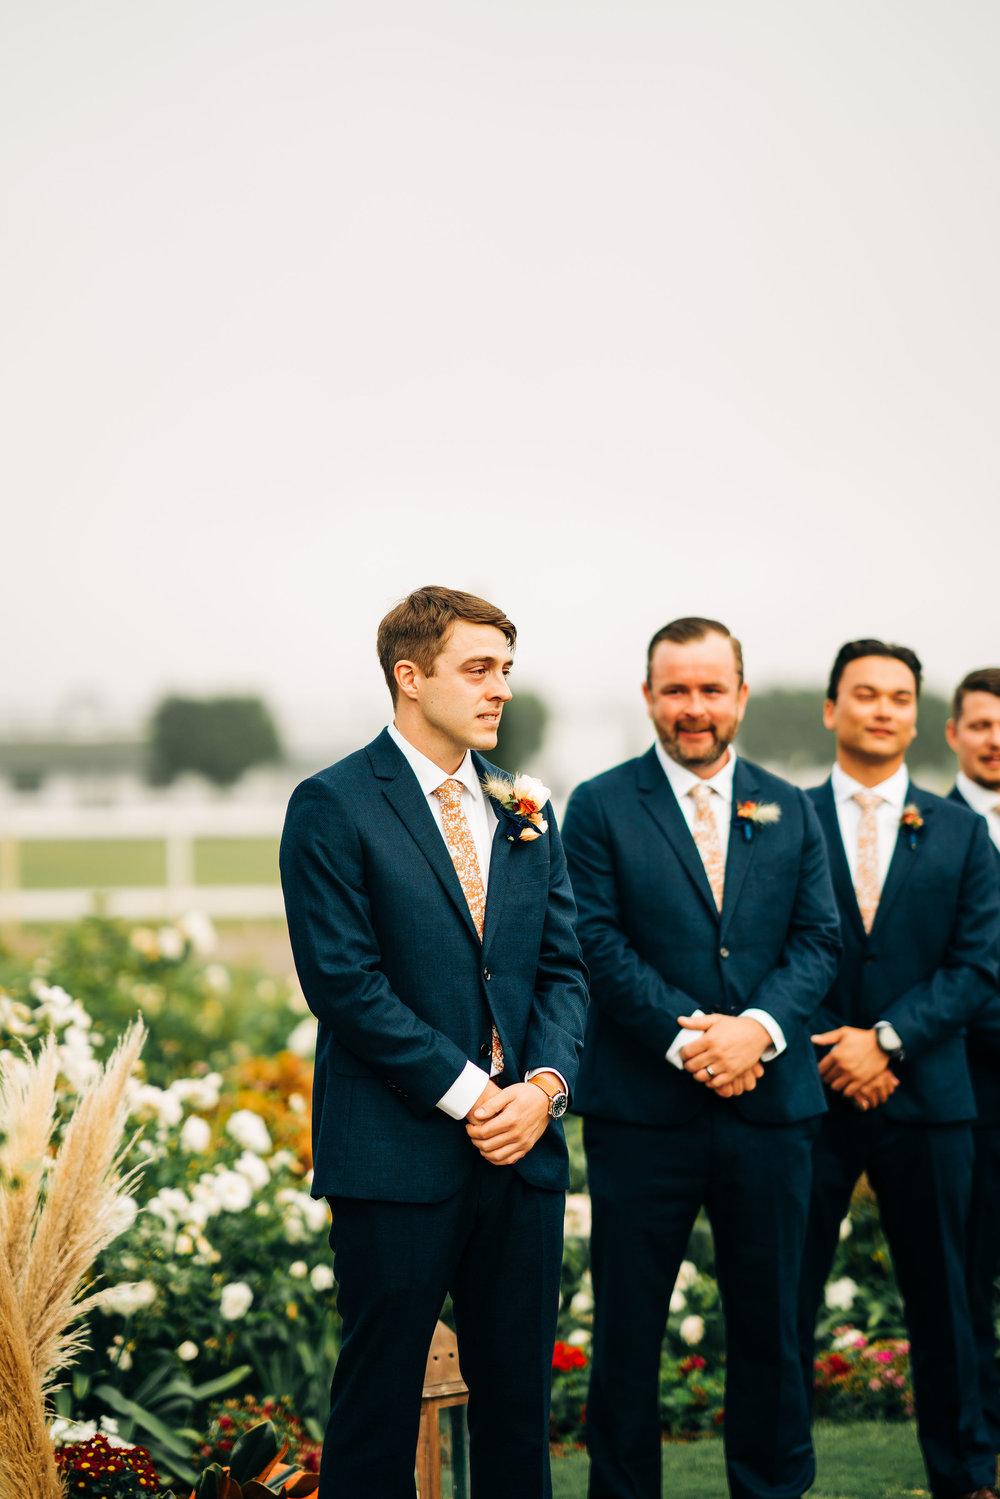 allie-shupe-tyler-wiggins-wedding-santa-barbara 088.jpg